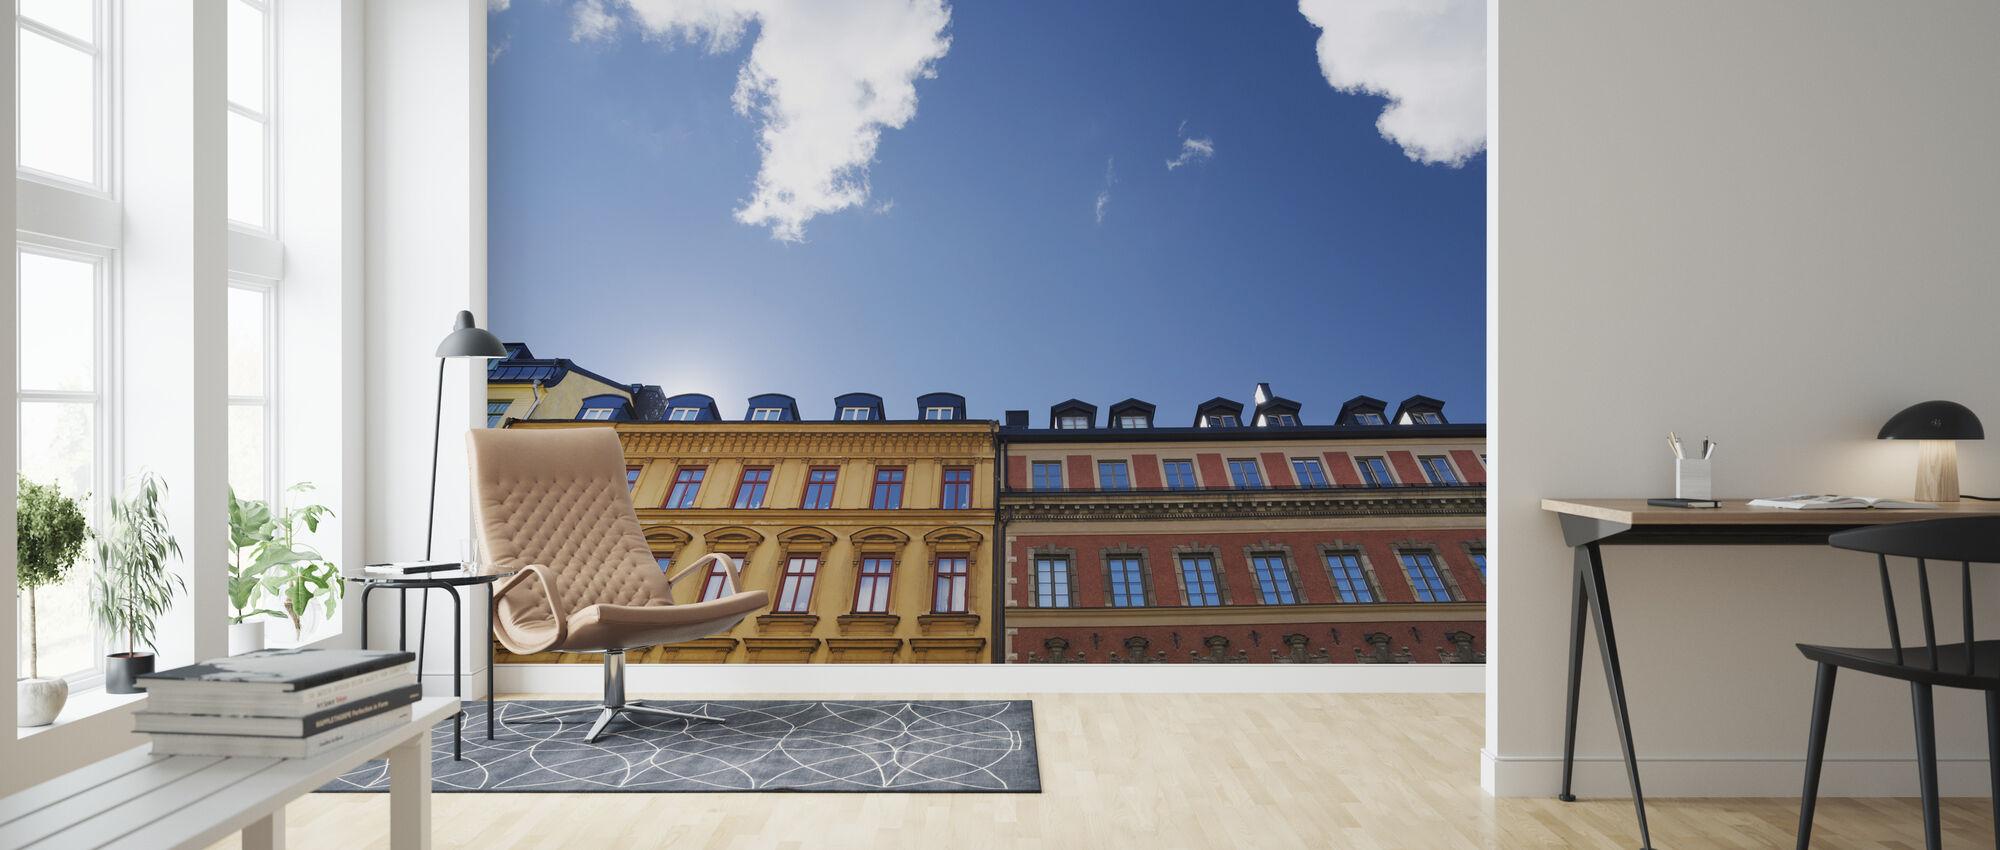 Vivid Colors of Buildings in Stockholm - Wallpaper - Living Room